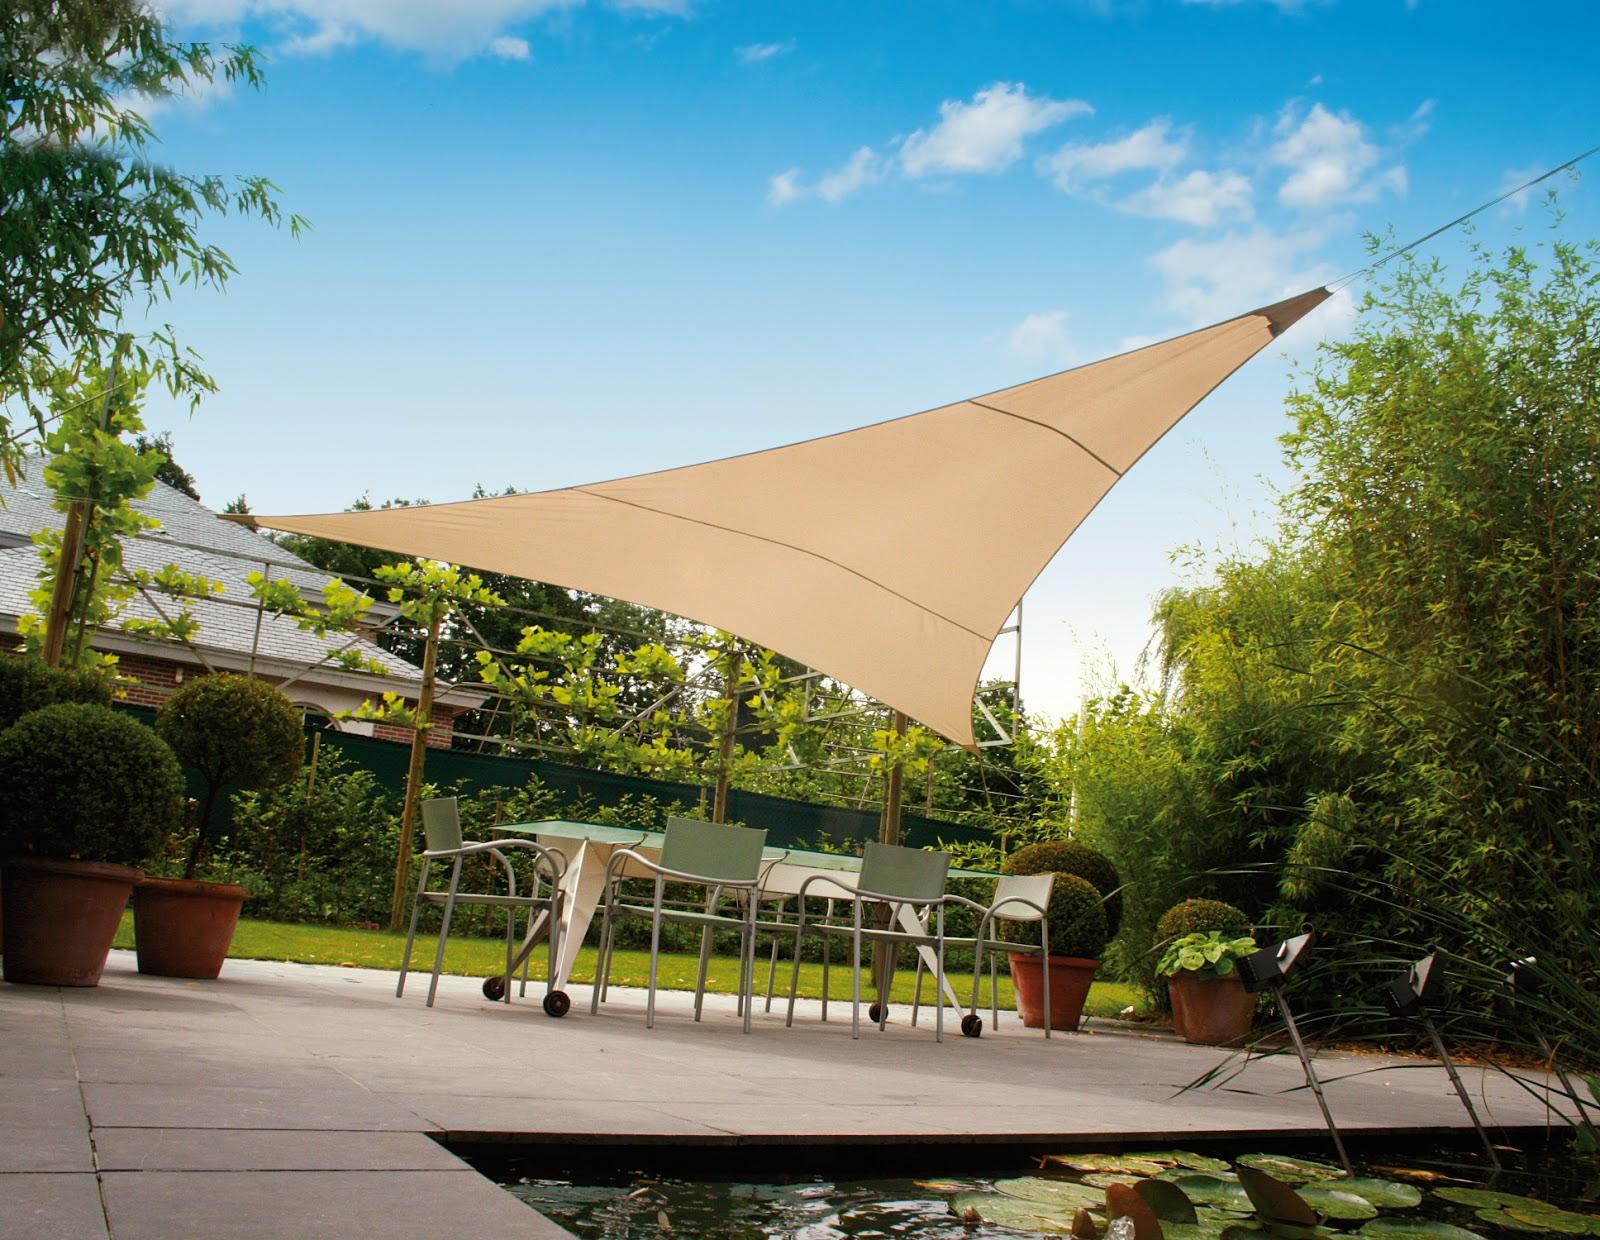 piscina online tendas para rea externa. Black Bedroom Furniture Sets. Home Design Ideas